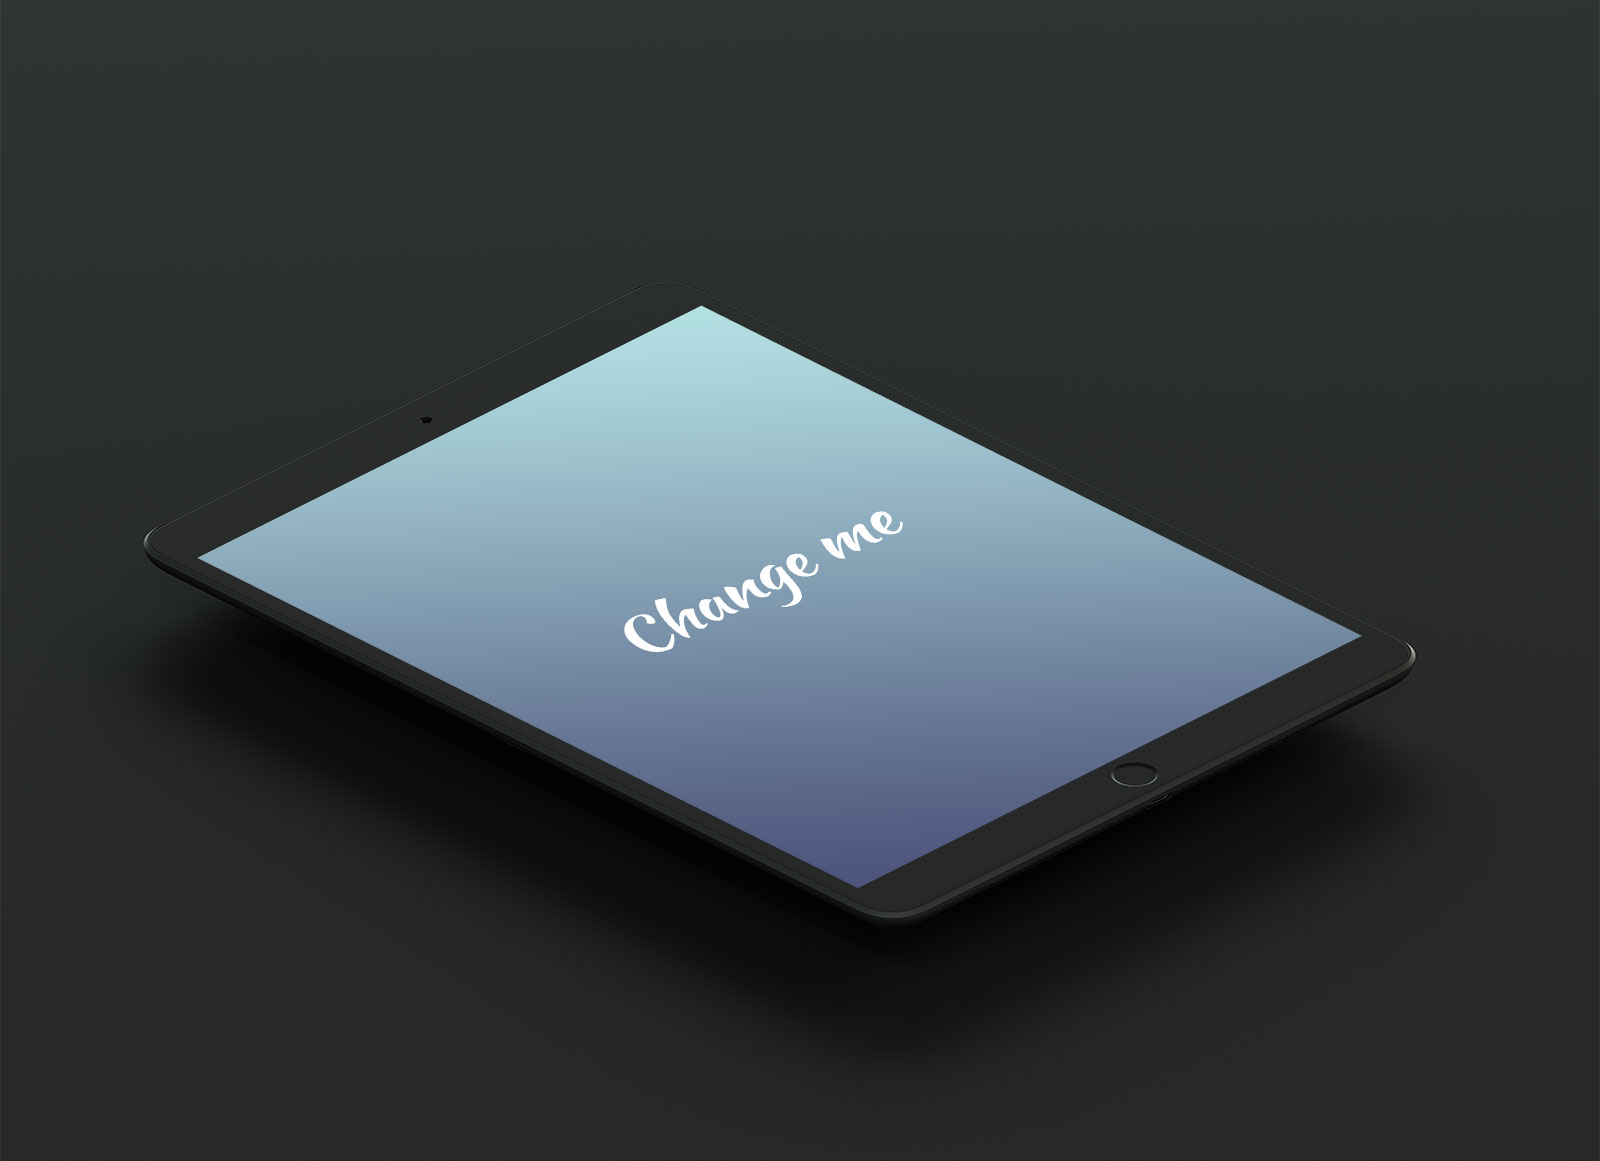 Free-Isometric-Matte-Black-iPad-Pro-10-5-Mockup-PSD